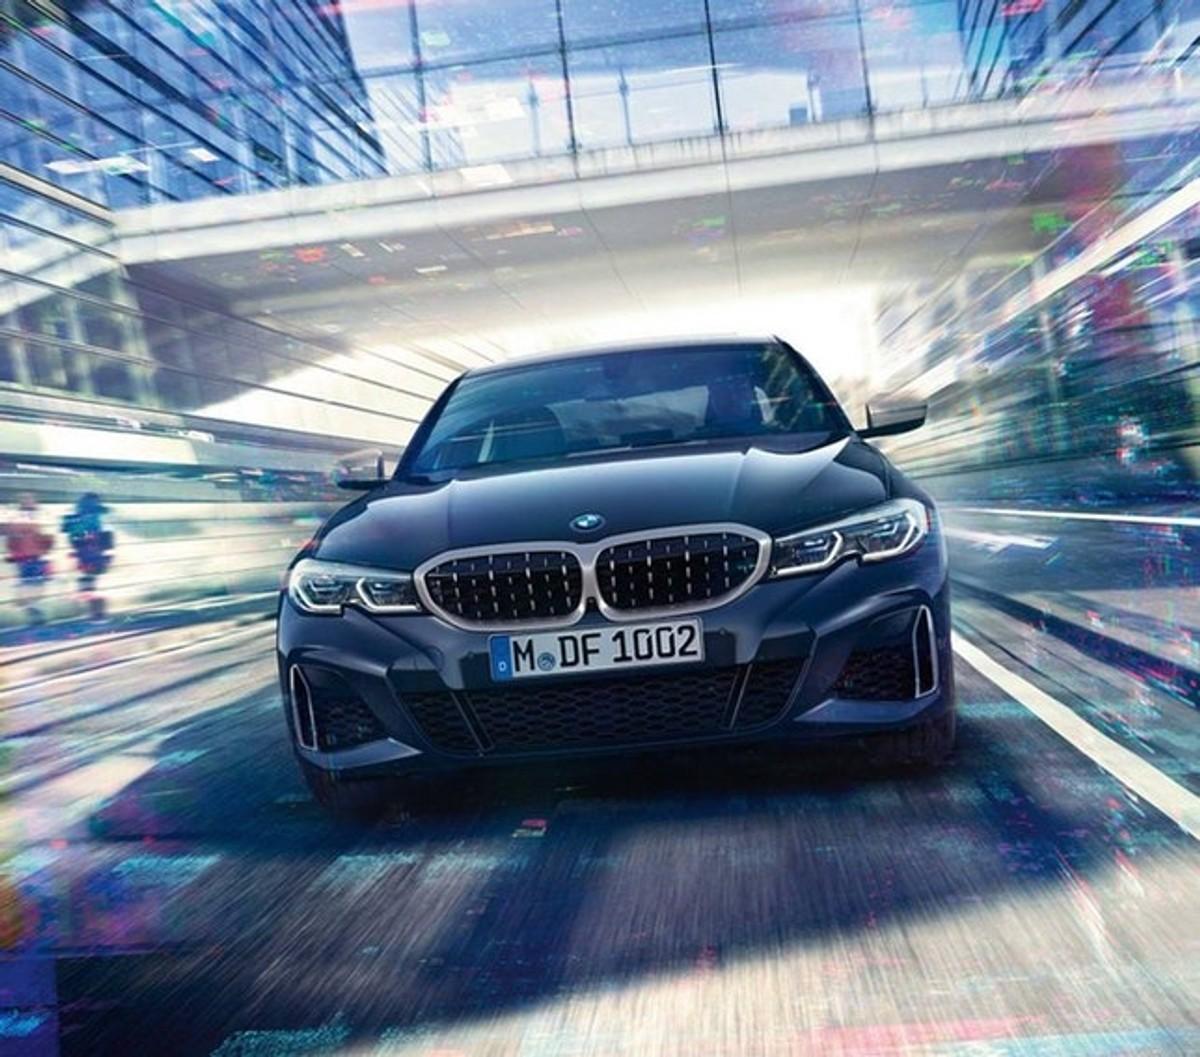 Mini Cooper Dealers >> The new BMW M340i: Your budget-friendly M3 - Cars.co.za